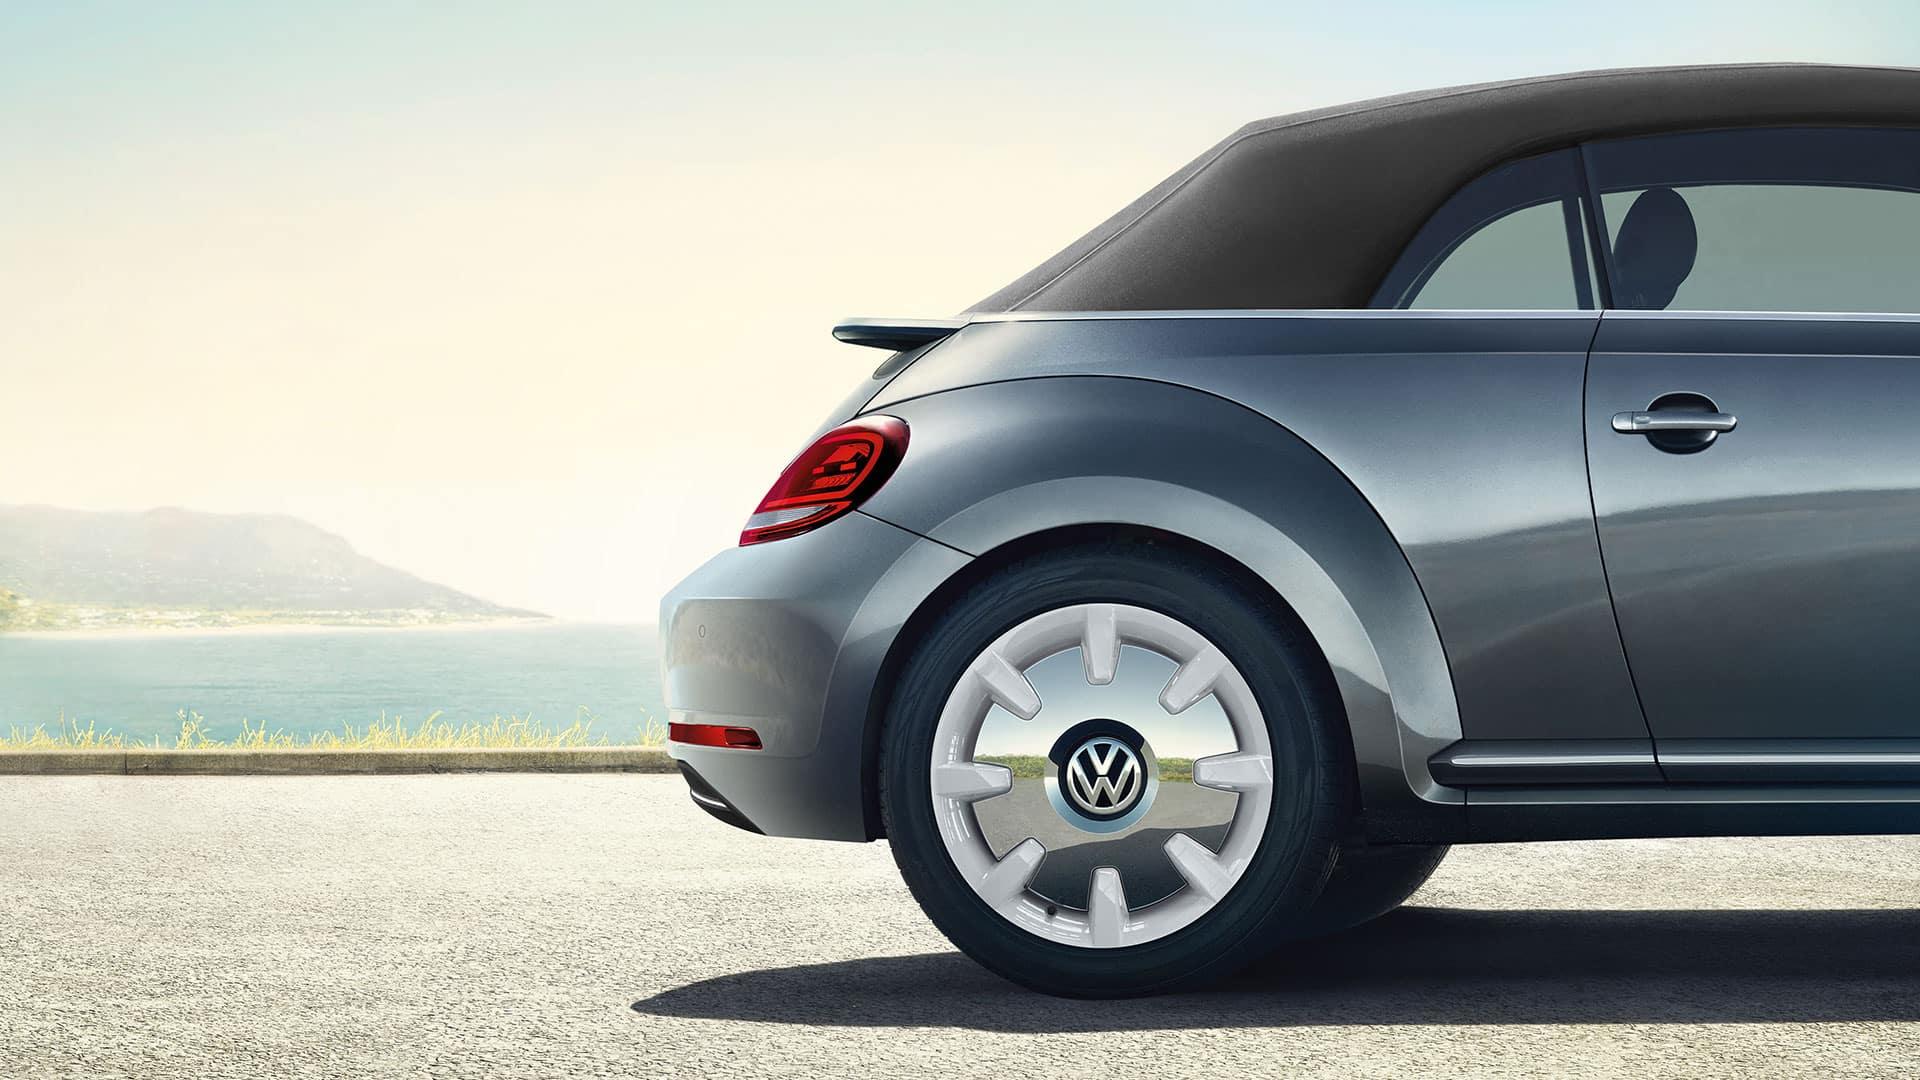 2019 VW Beetle Convertible Wheels